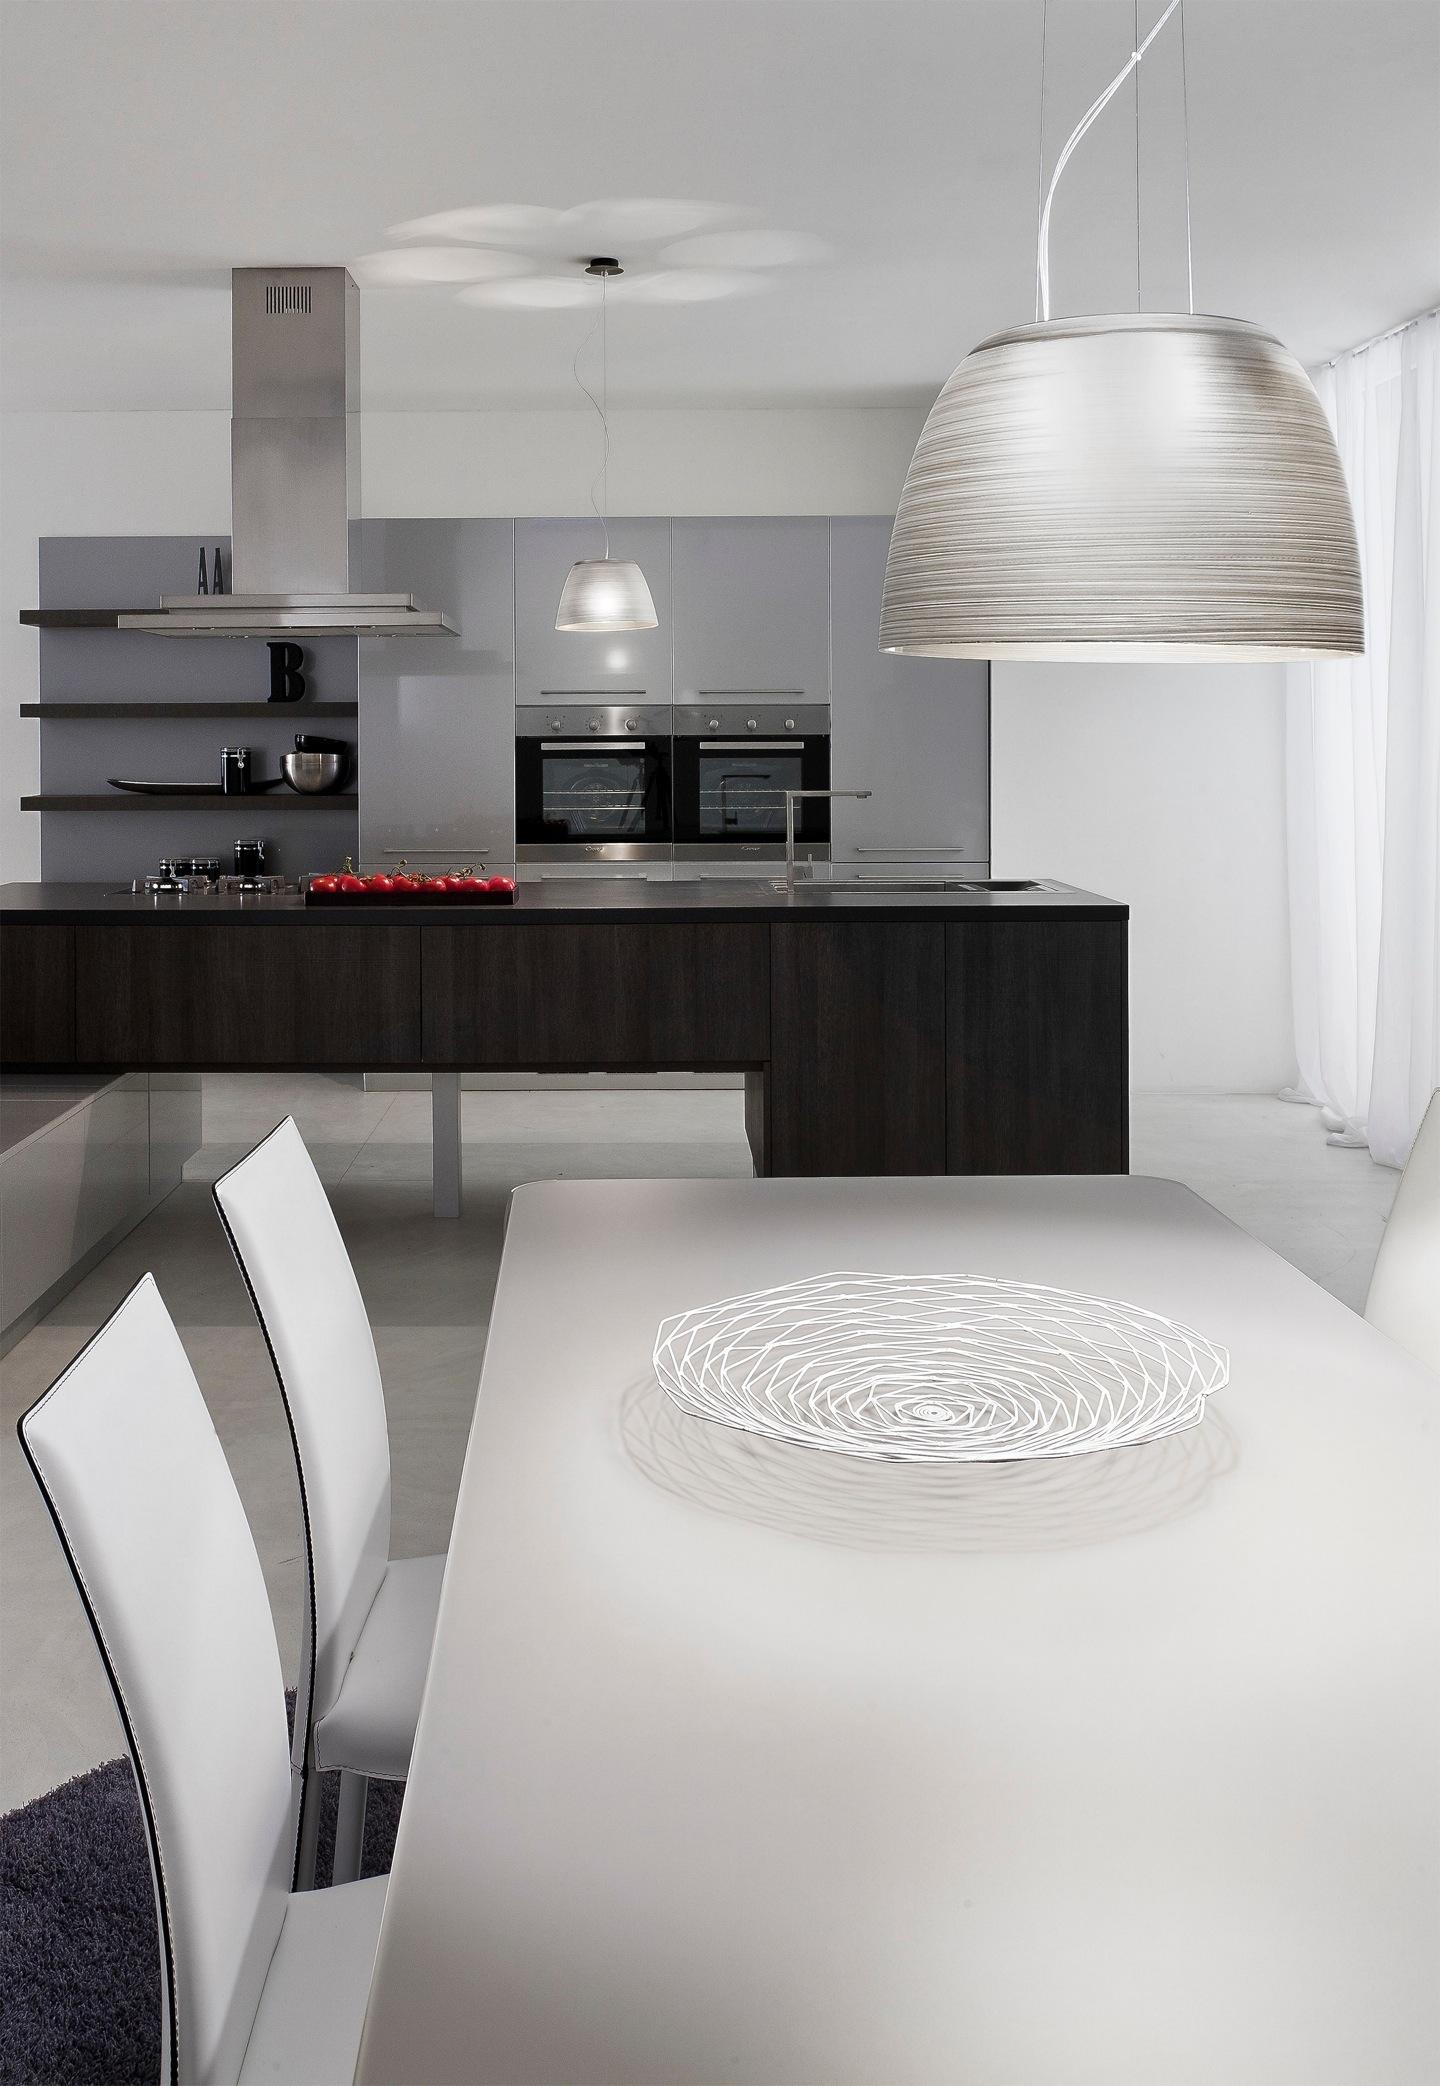 Forum illuminazione cucina con due punti - Luce per cucina ...